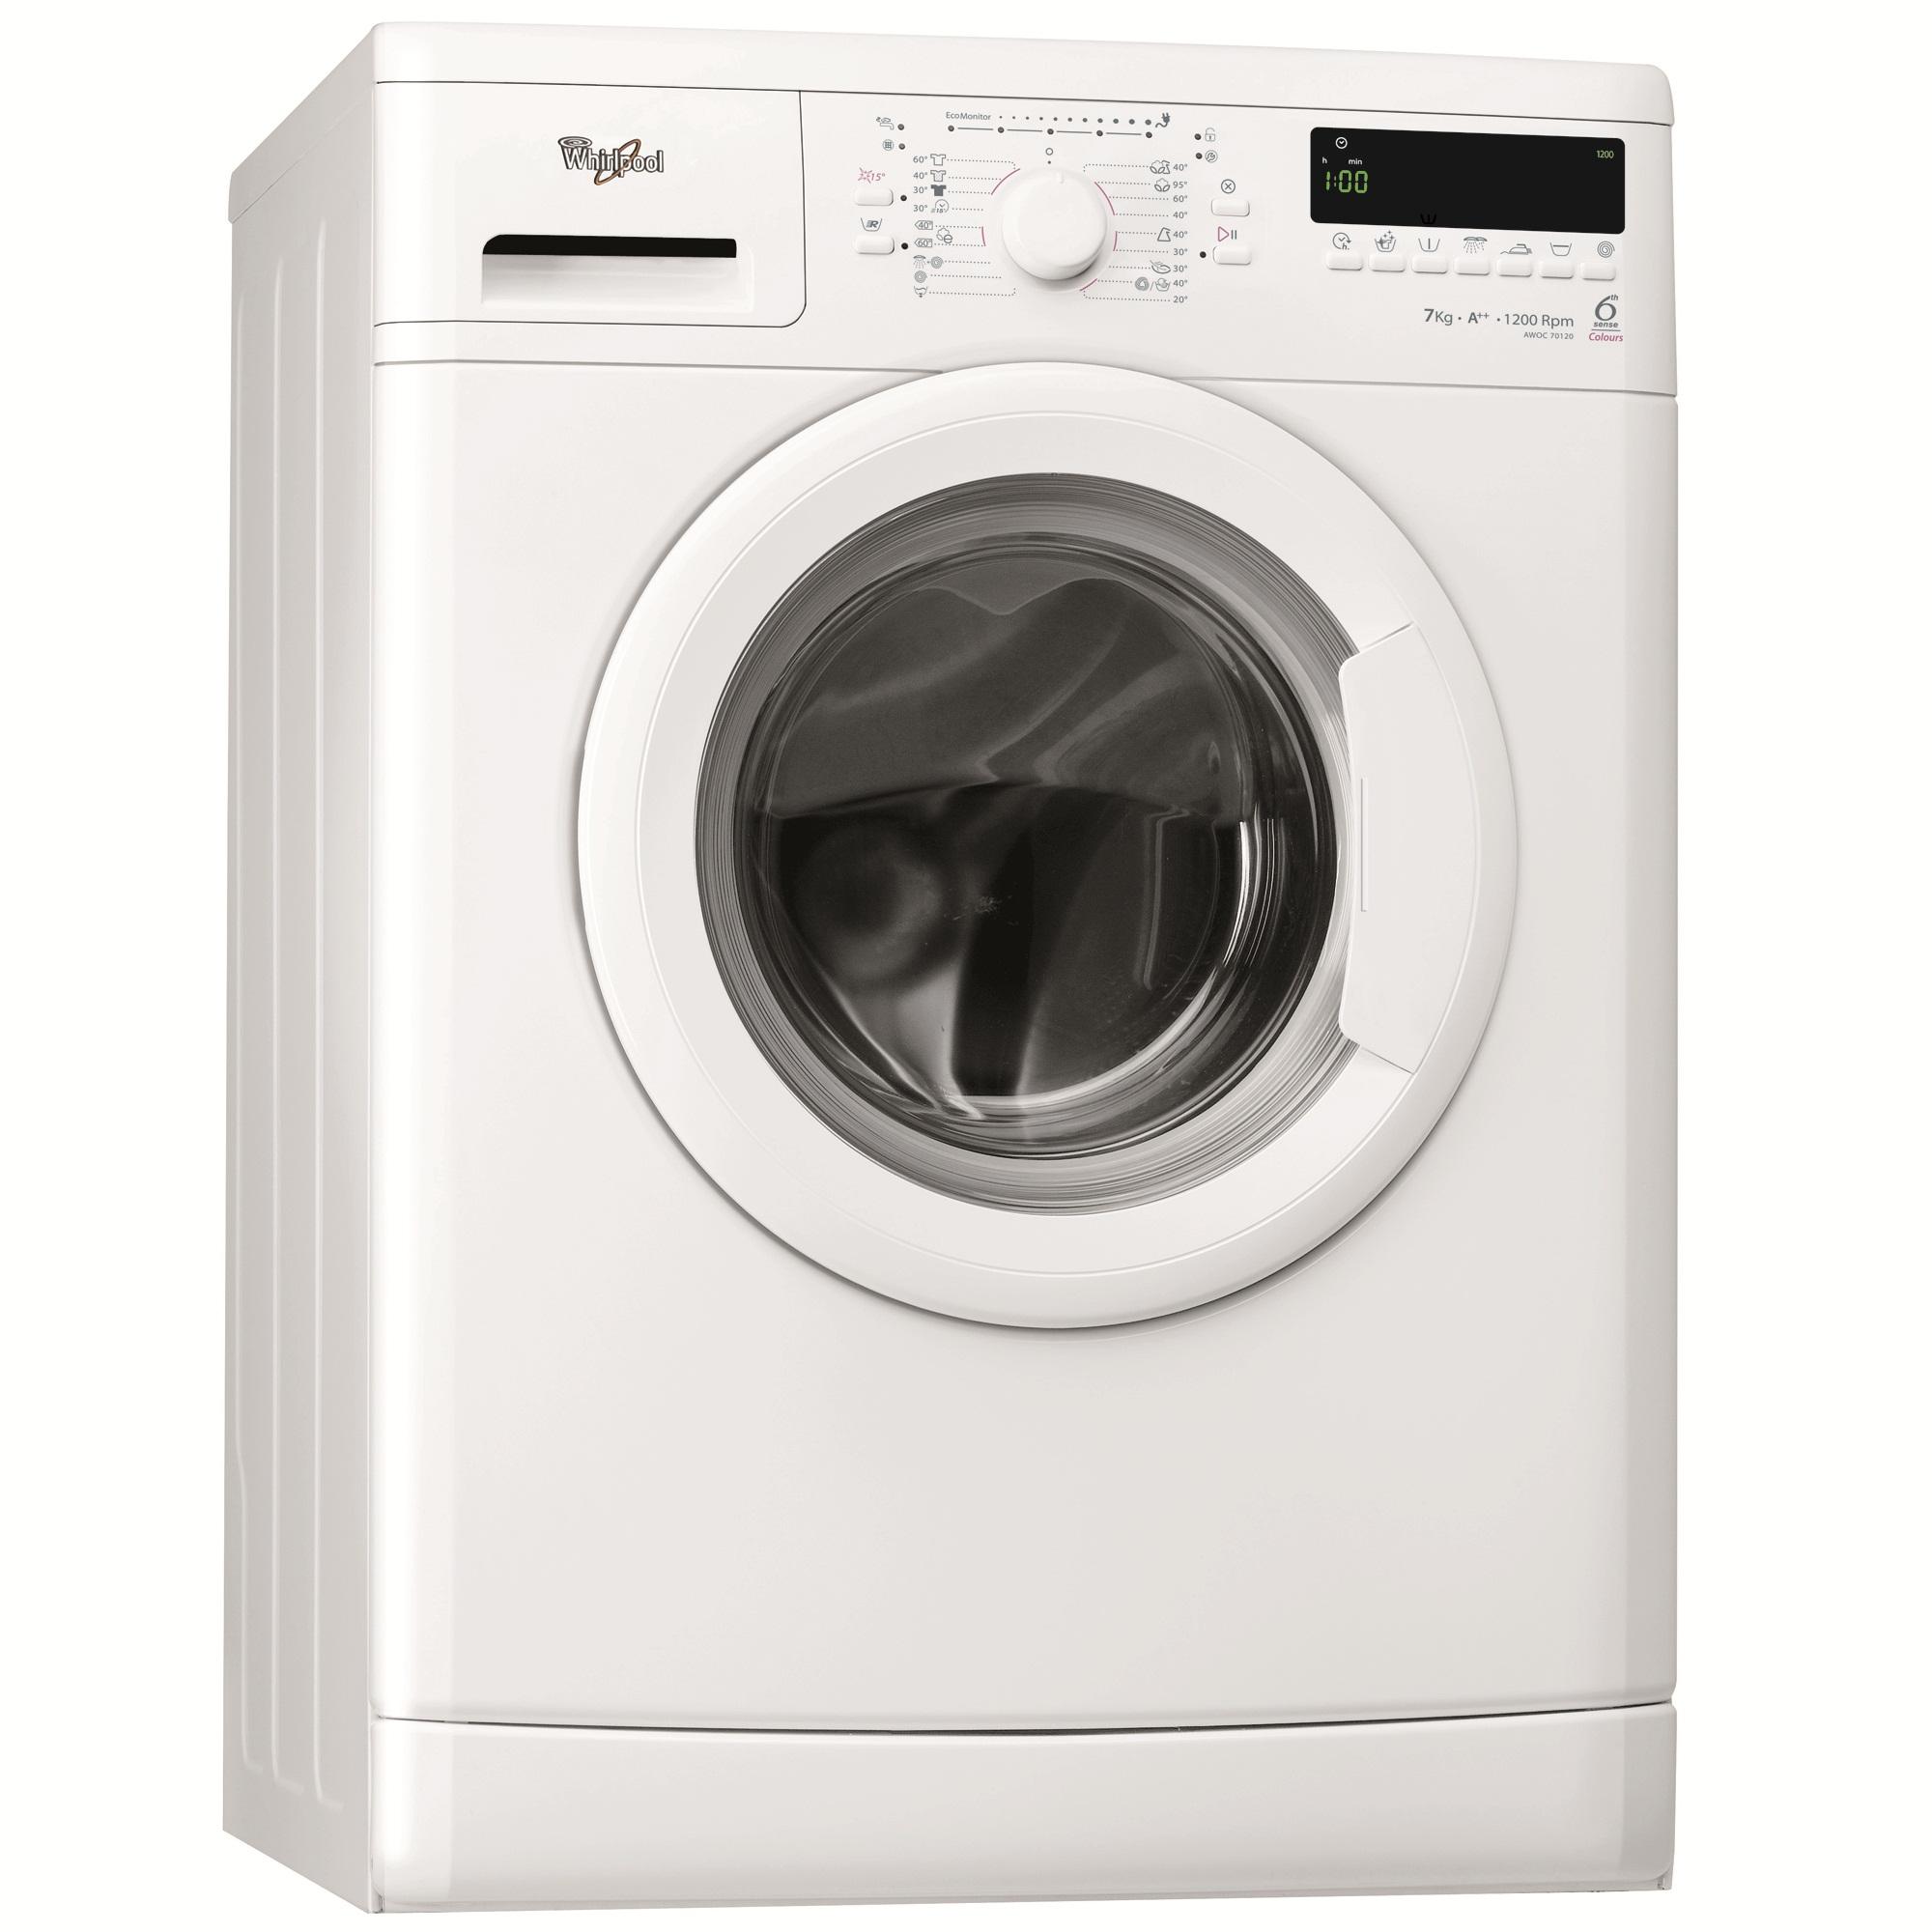 Masina de spalat rufe 6th Sense Whirlpool AWOC70120, 1200 RPM, 7 Kg, A++